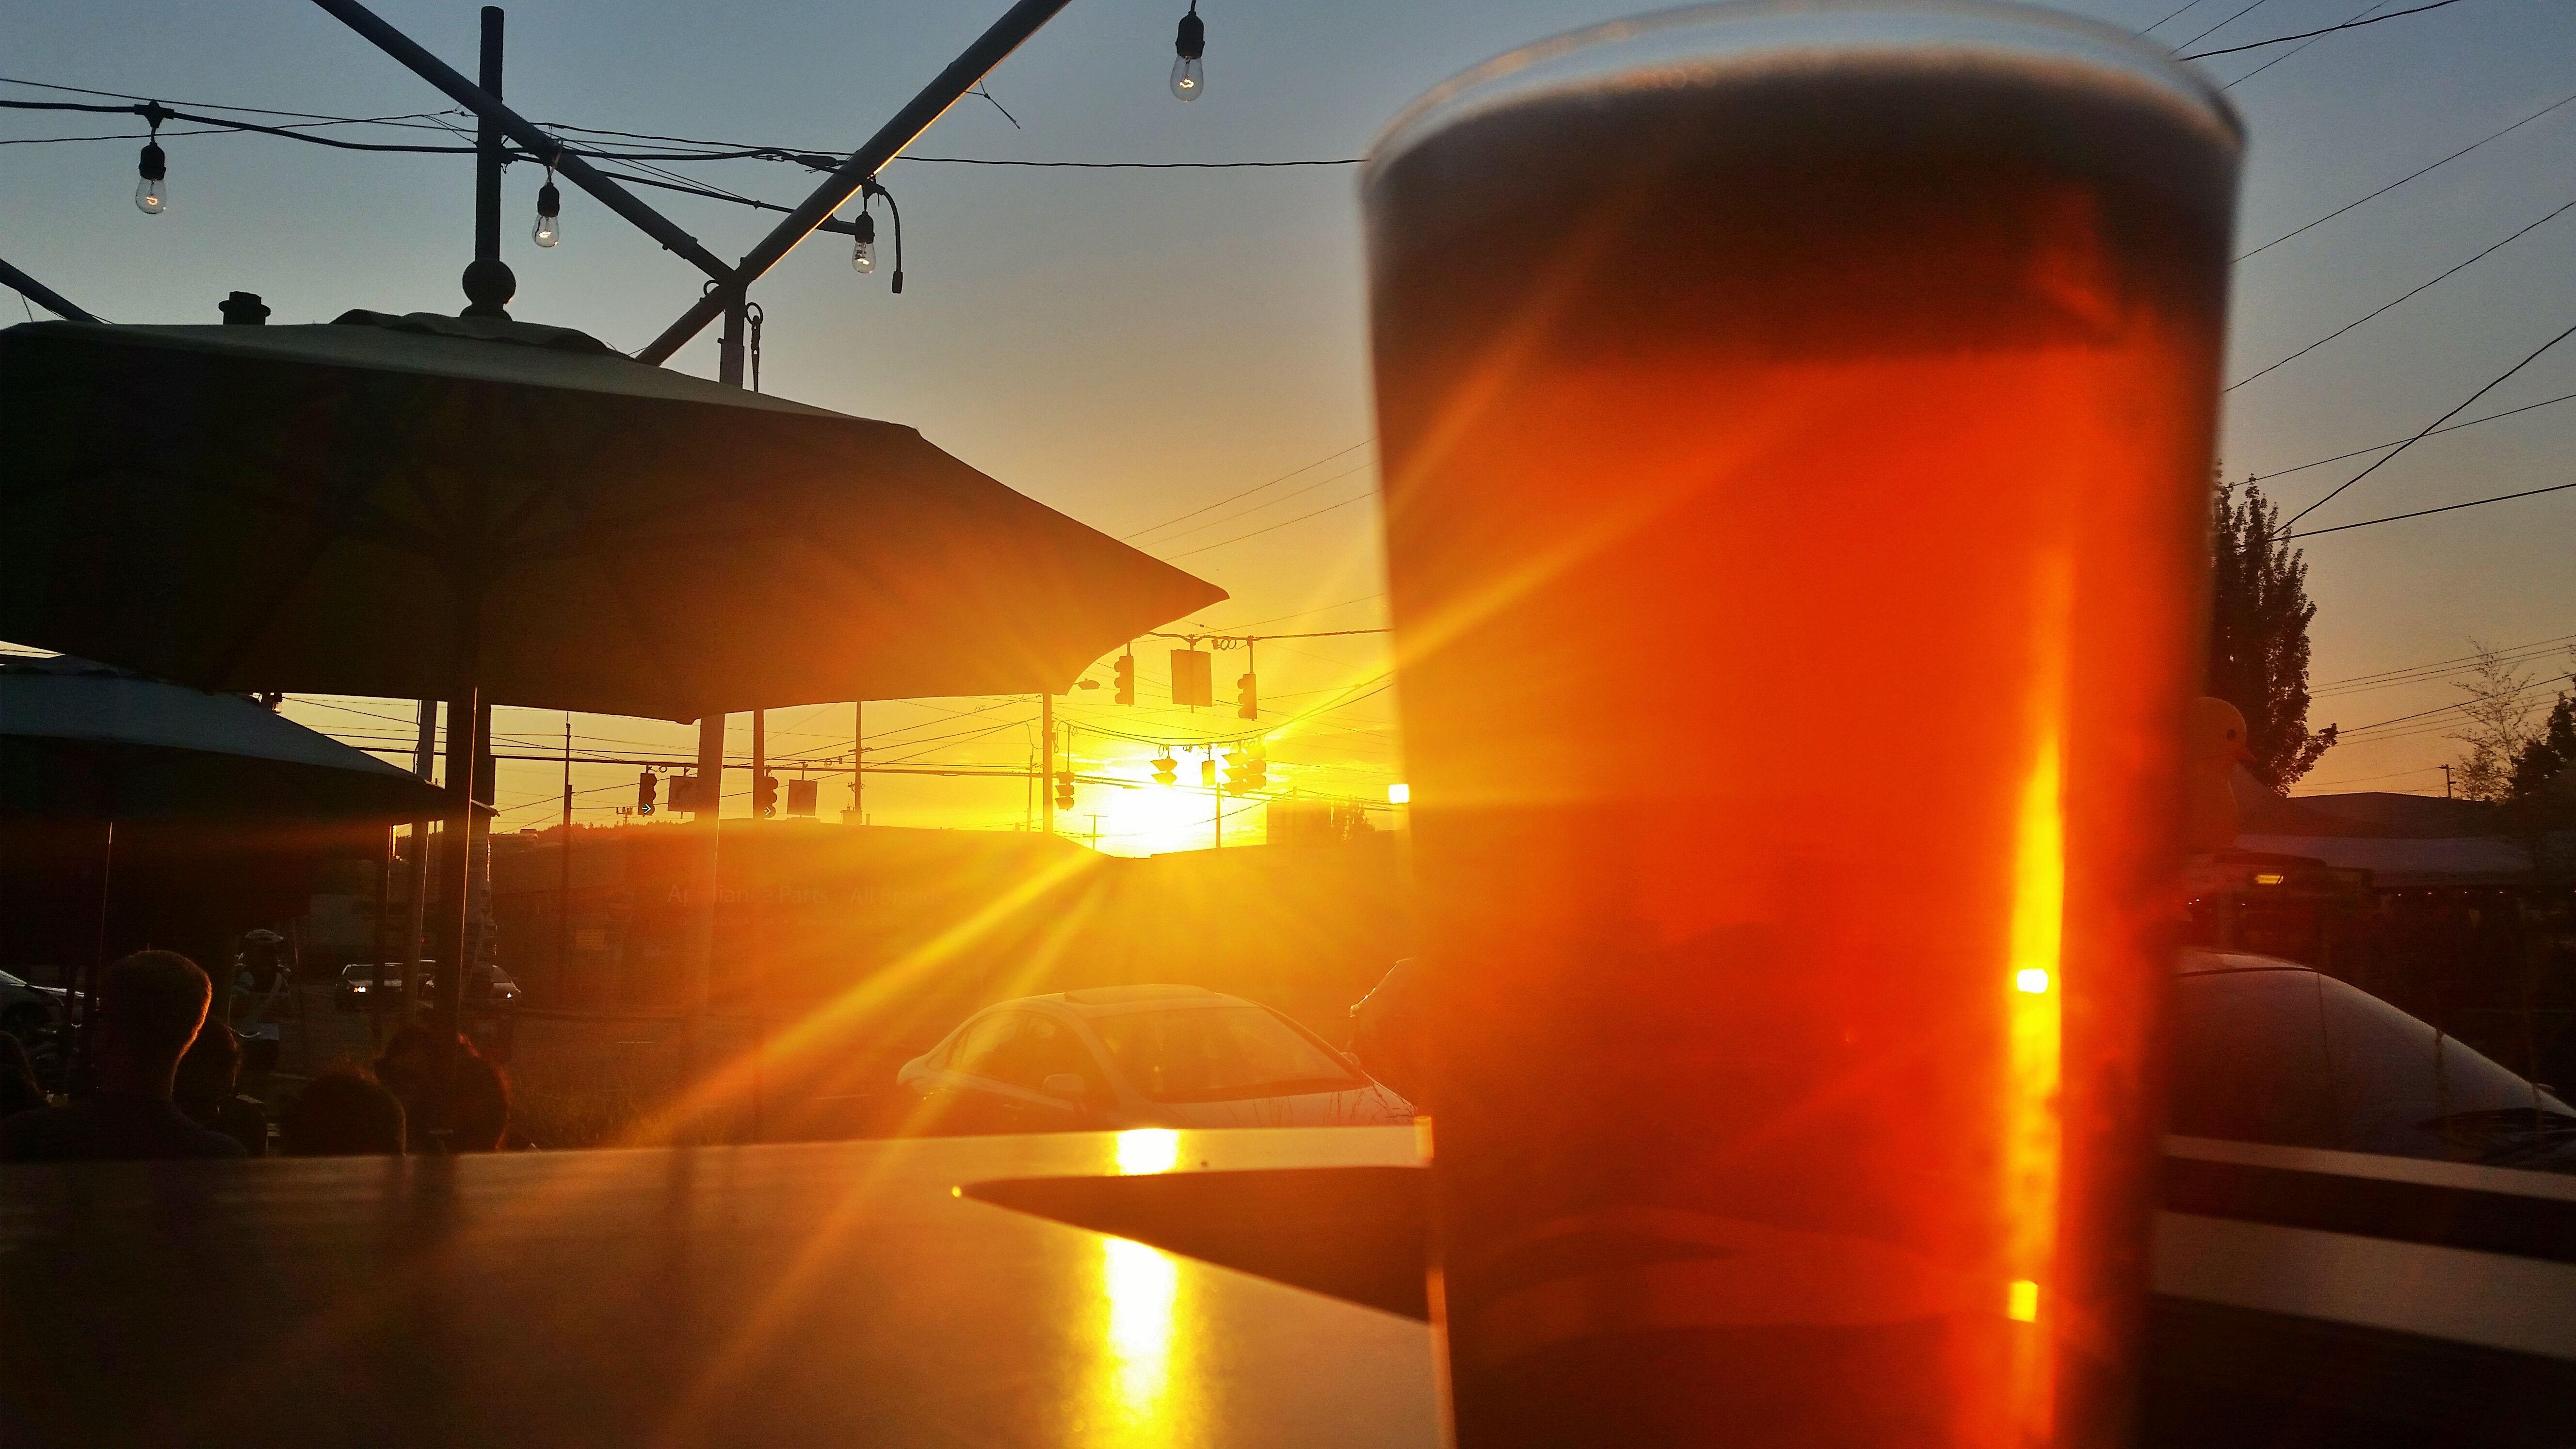 10 Best Beer bars with outdoor patios | Home in Portland ...